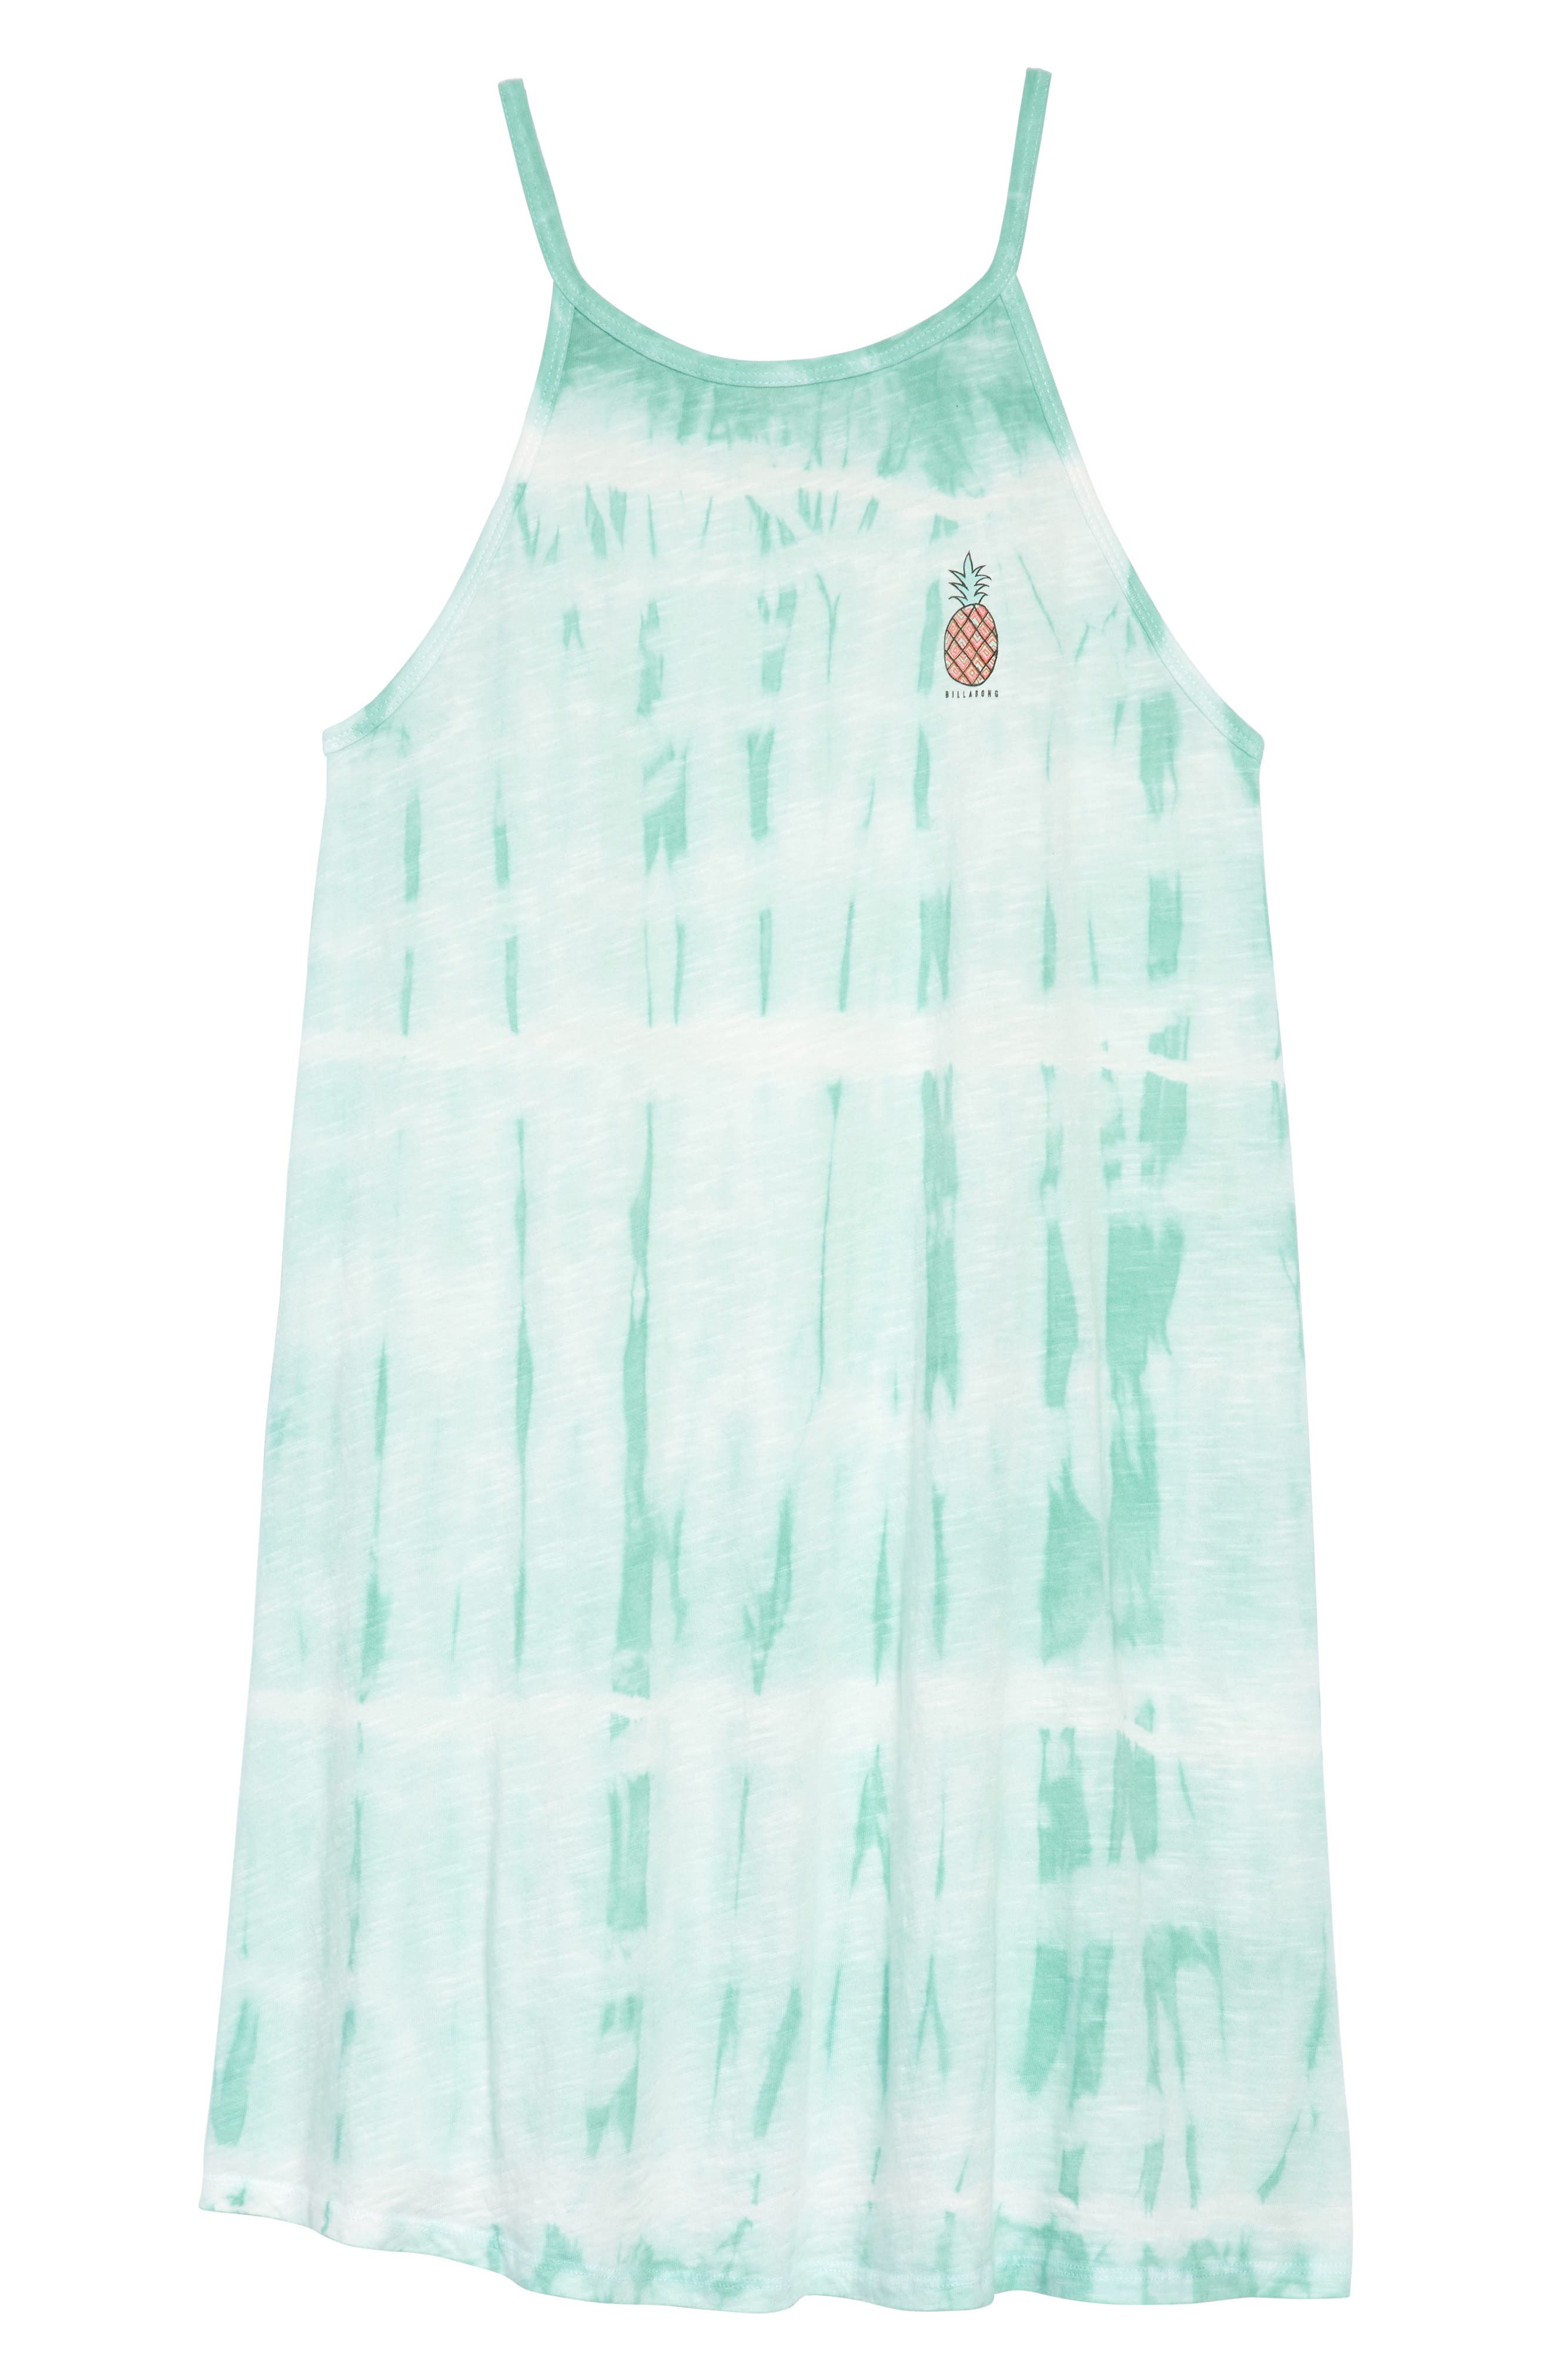 BILLABONG Namaste All Day Tie-Dye Dress, Main, color, 414